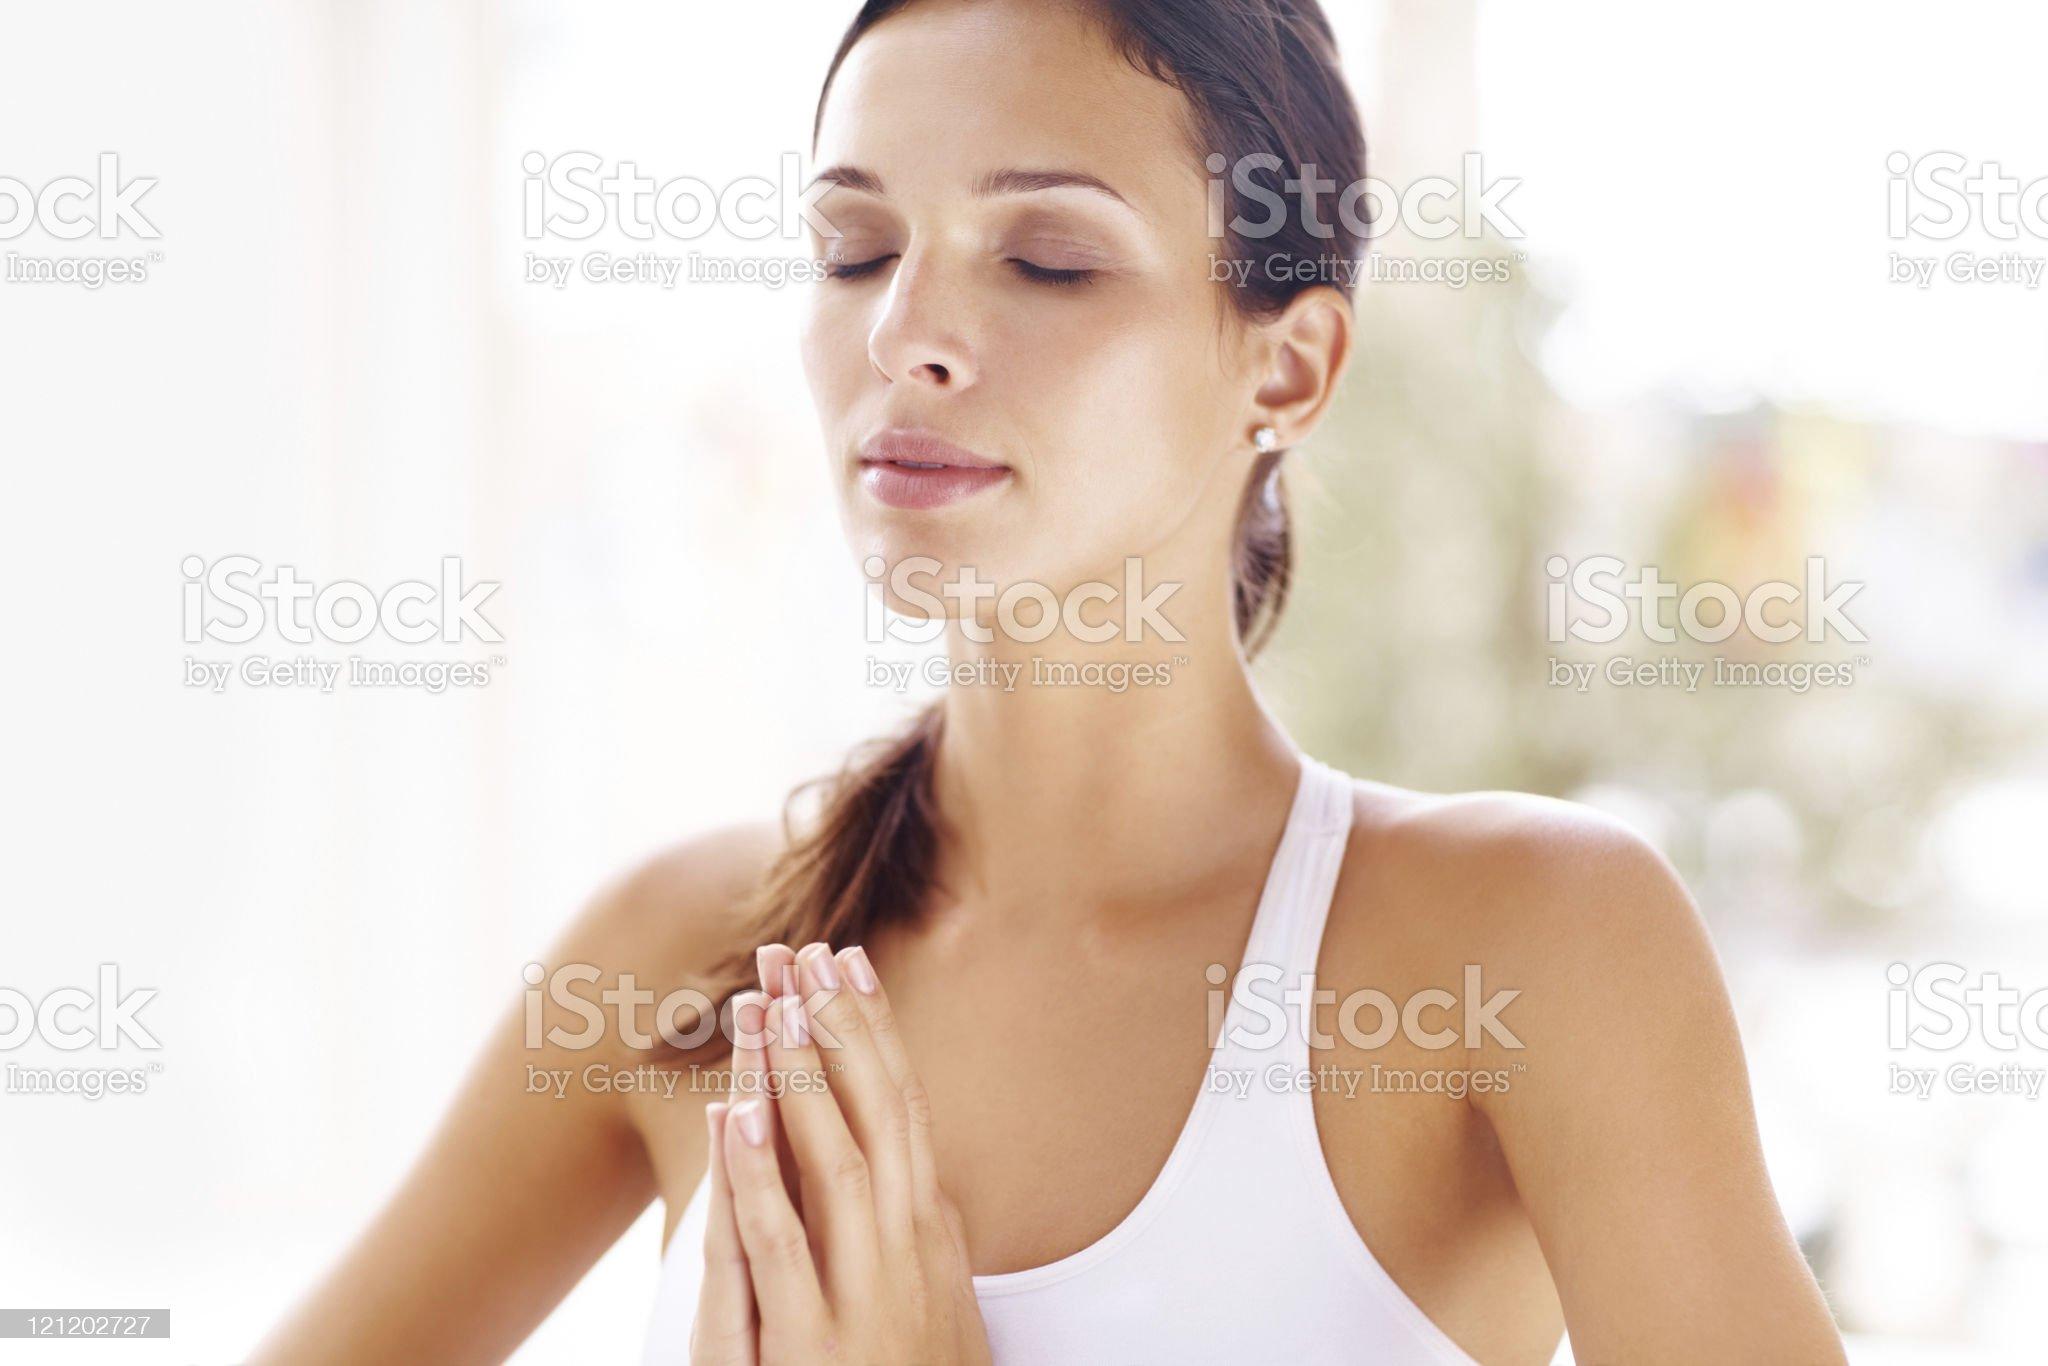 Young female meditating royalty-free stock photo